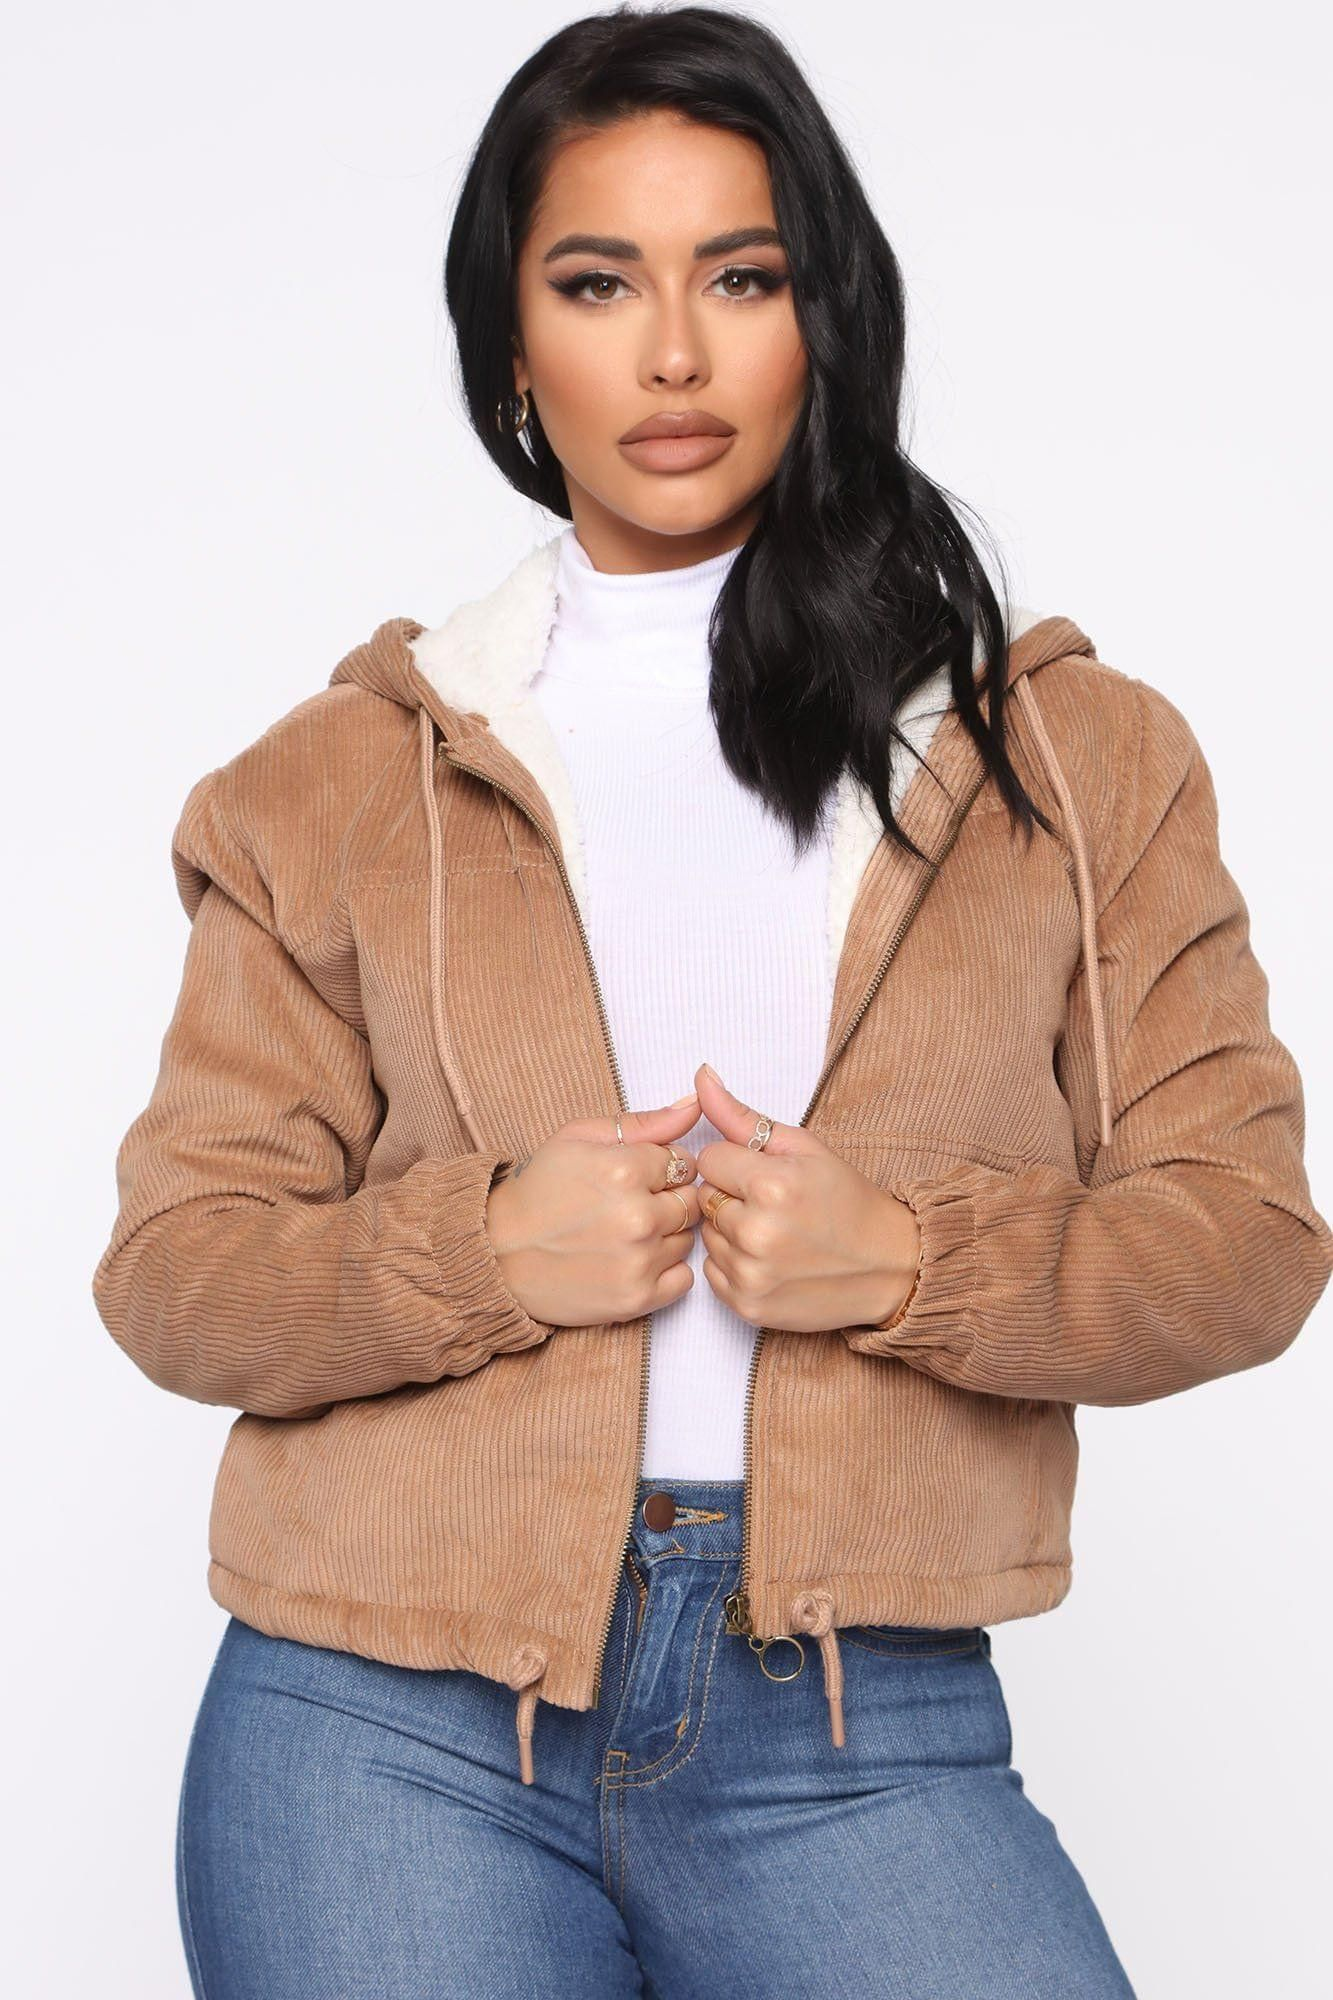 Women Alessandra Corduroy Bomber Jacket Tan 23 Bomber Jacket Fashion Fuzzy Jacket [ 2000 x 1333 Pixel ]